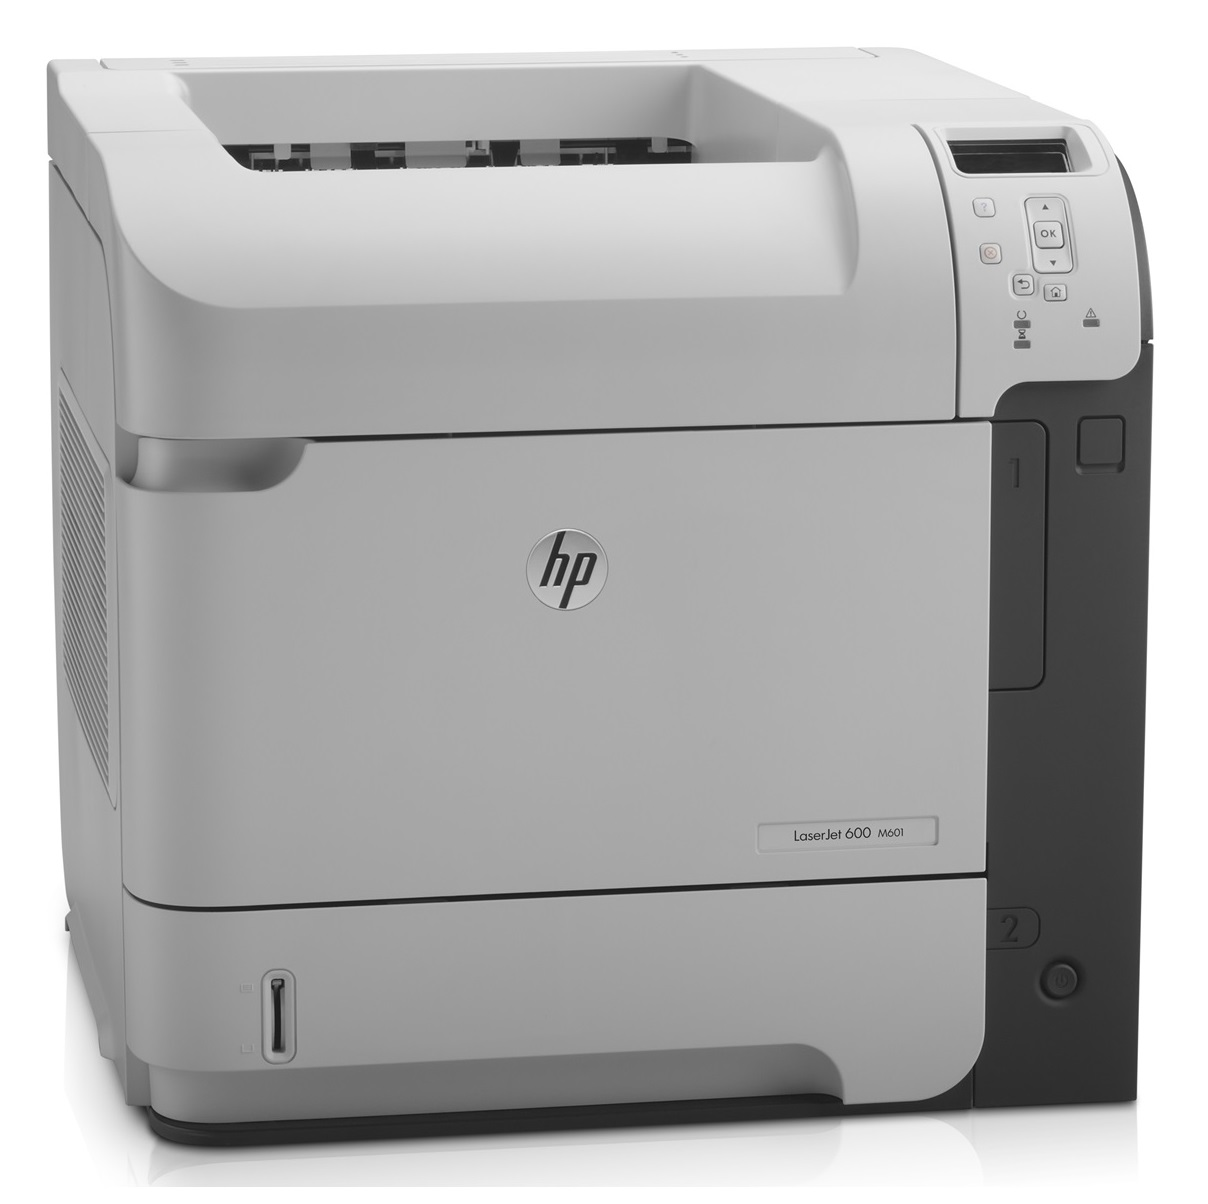 Máy in lasr HP Ent 600 M601DN-CE990A ( in mạng/ in 2 mặt tự động)